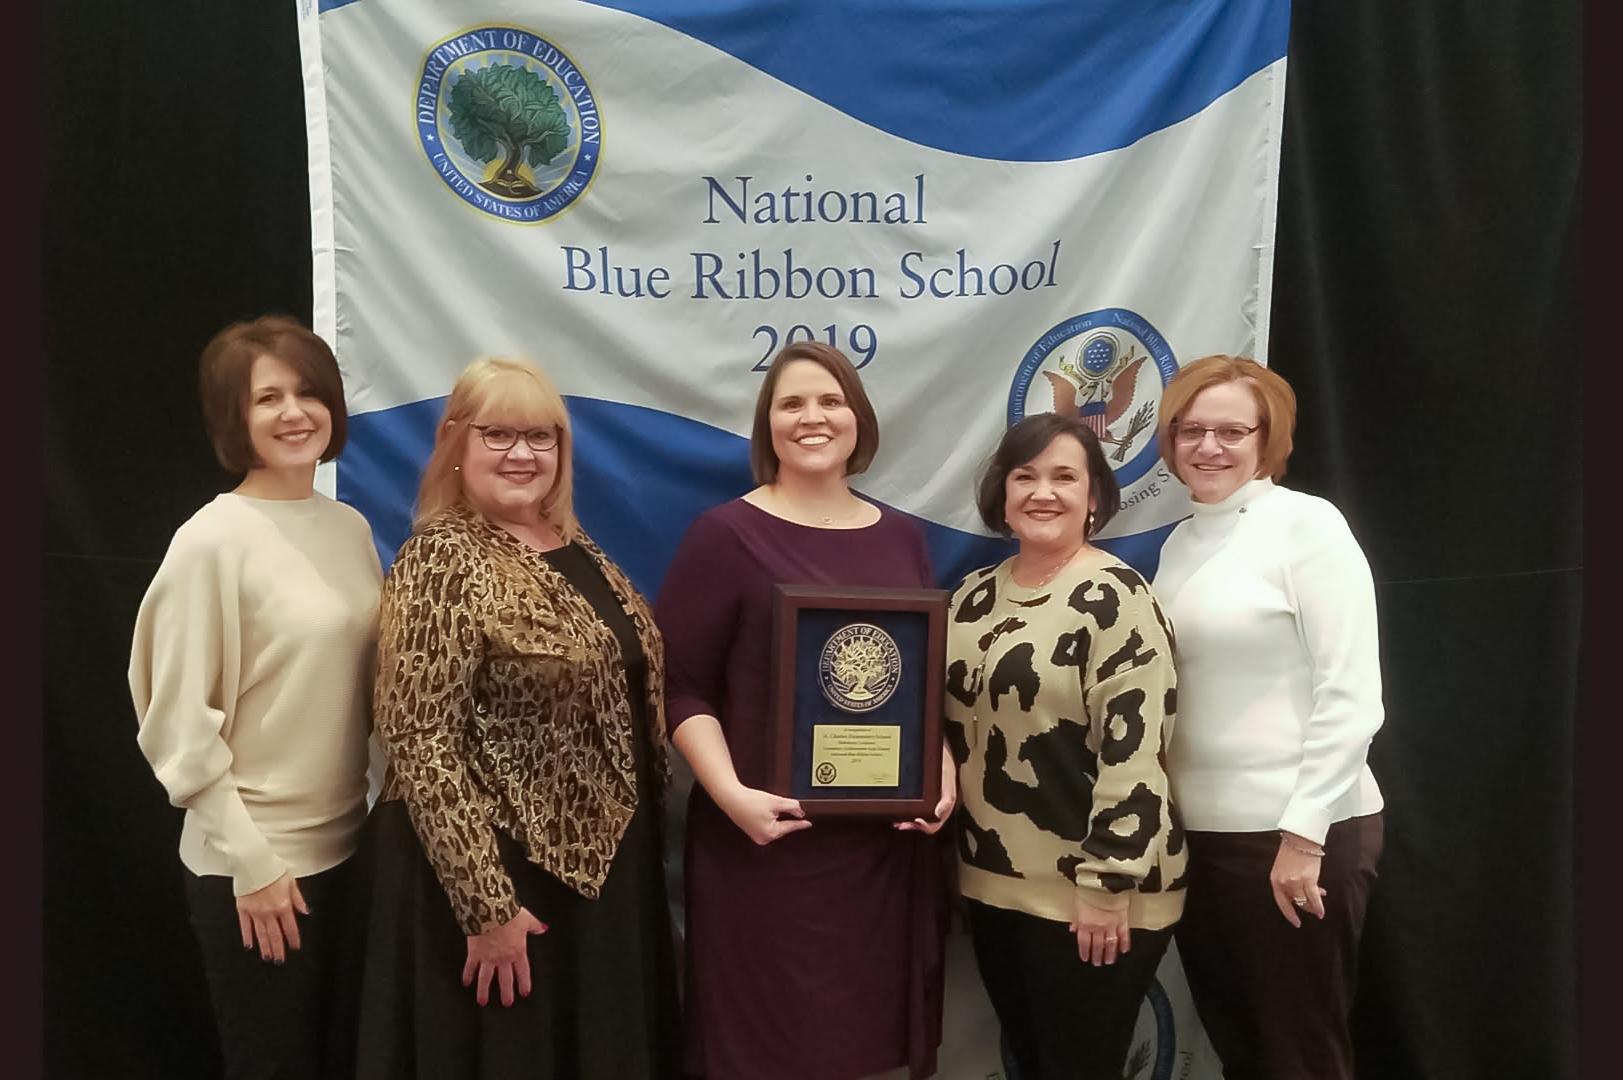 Blue Ribbon Award Ceremony - Washington DC